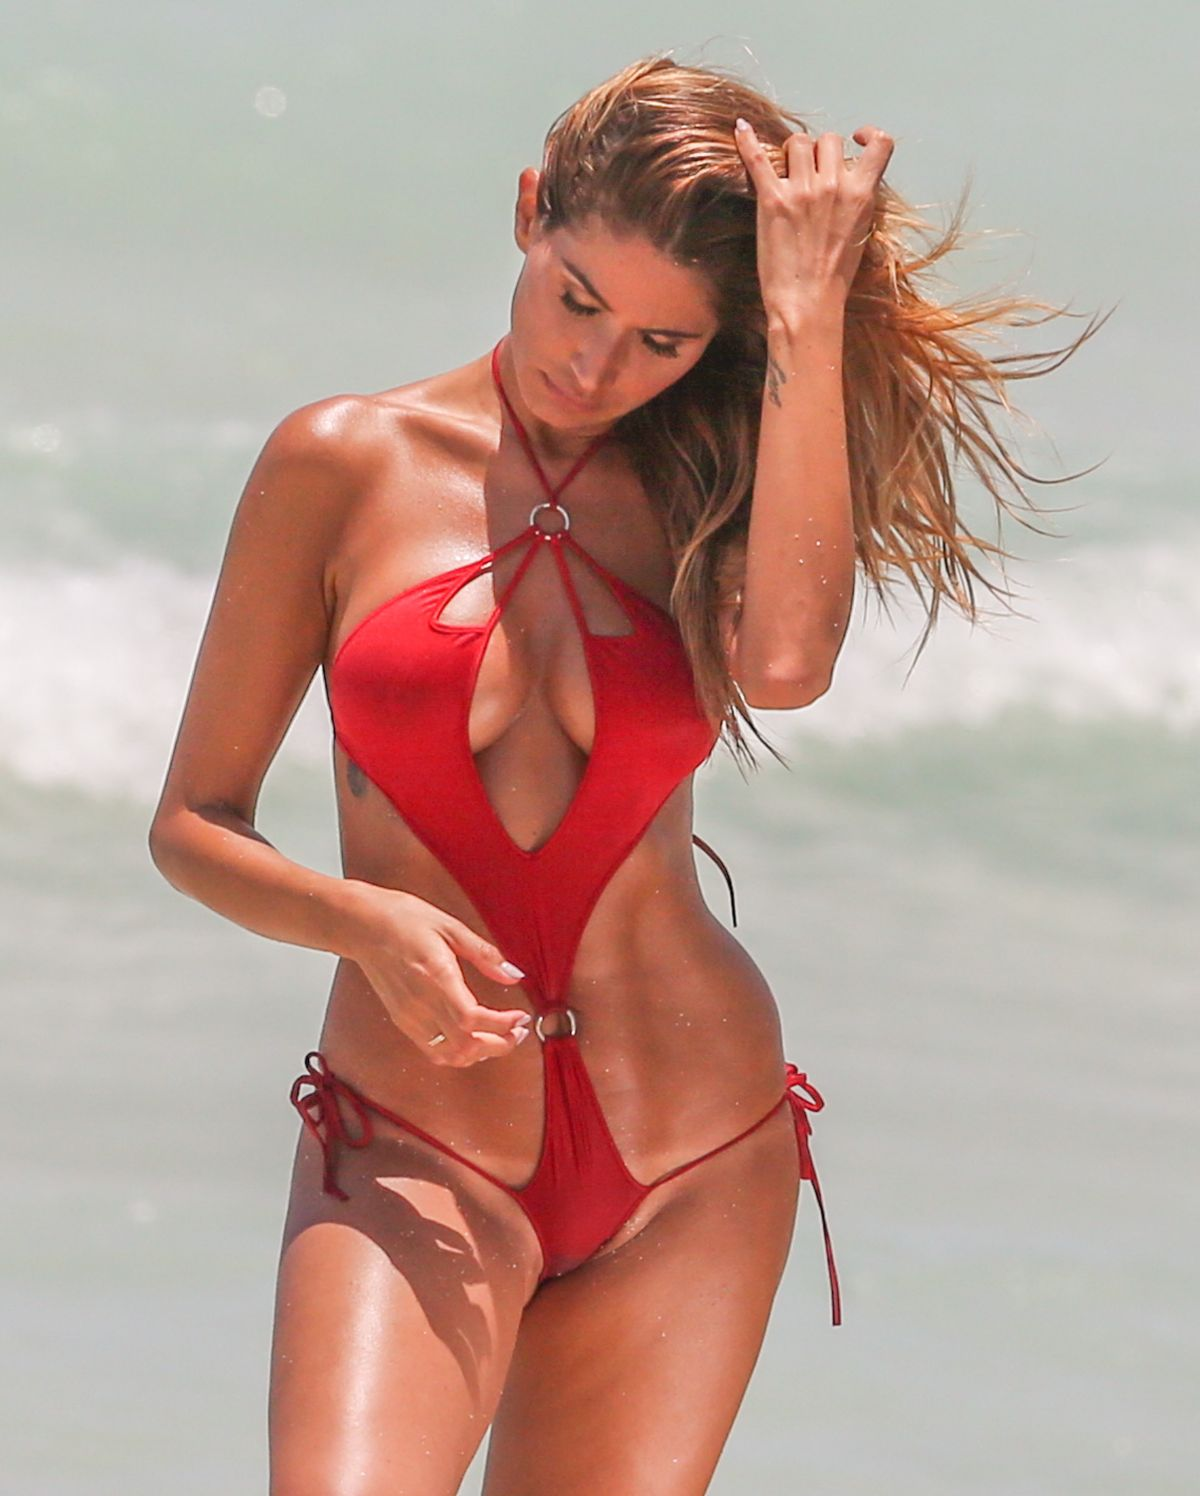 JULIANA PROVEN in Bikini on a Photoshoot at a Beach in Malibu 06/20/2016